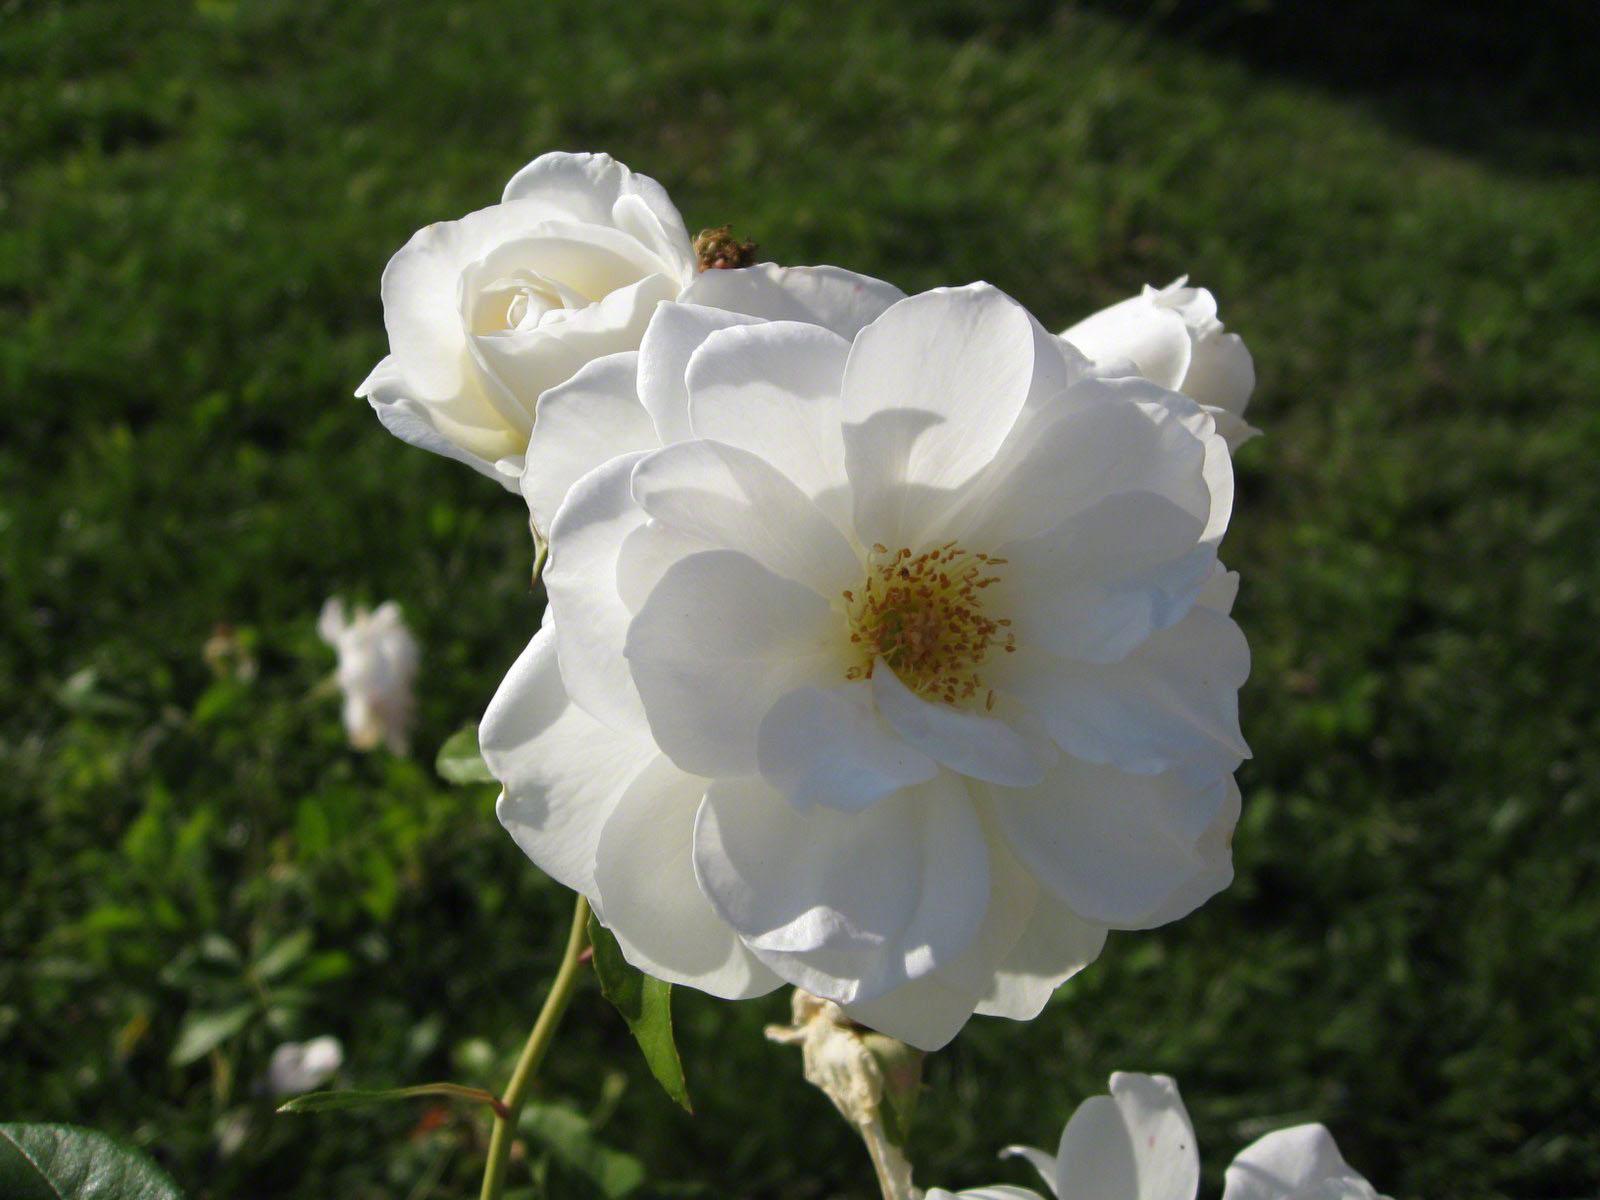 http://www.fabiovisentin.com/photography/photo/12/roses-wallpaper-roses-bouquets4363.JPG